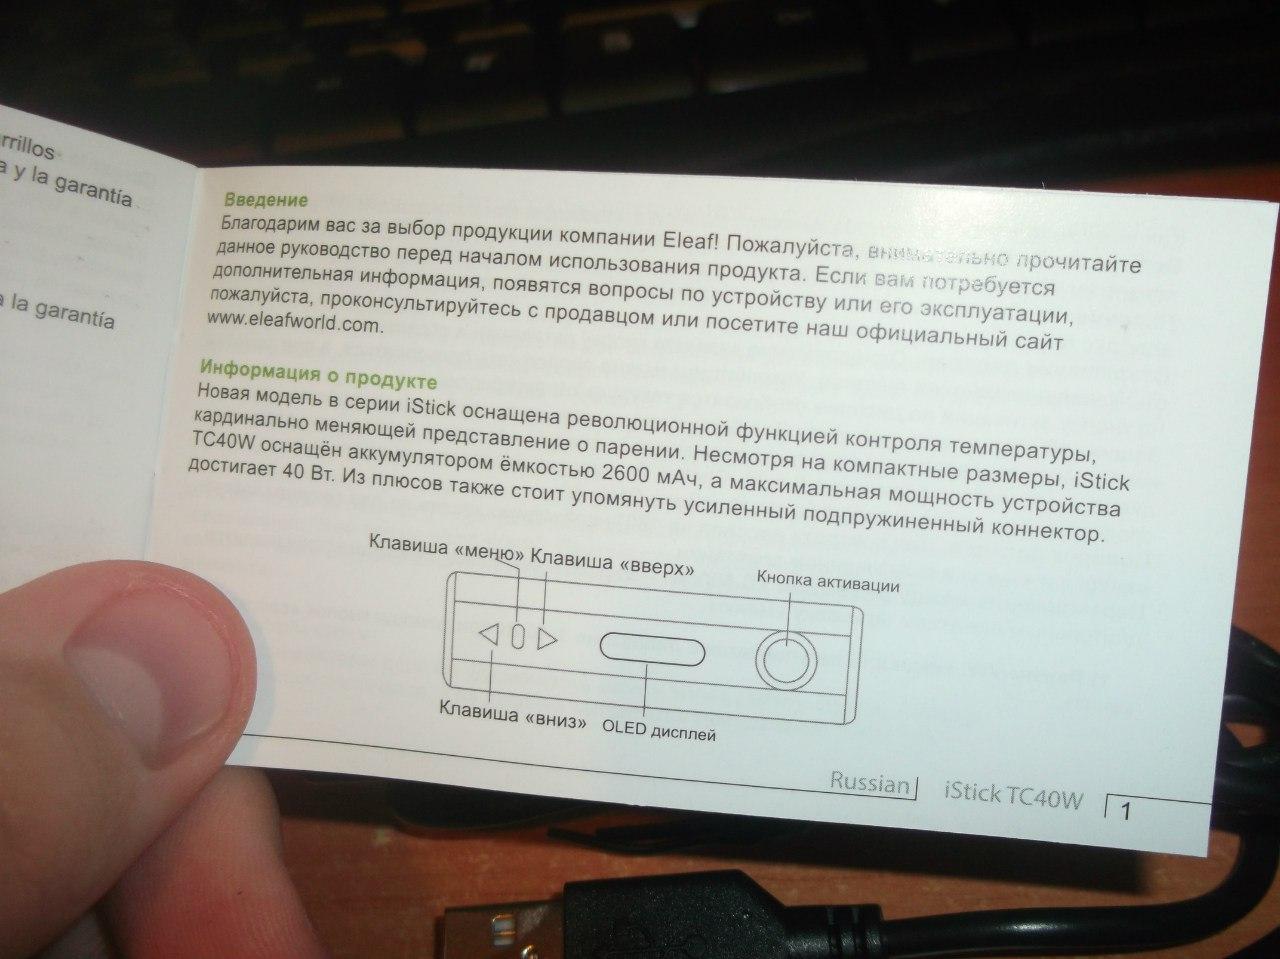 GearBest: Billow V2 - лучший бакомайзер на 2 спирали, тестируем его в связке с карманным боксмодом 'Eleaf Istick 40W'.